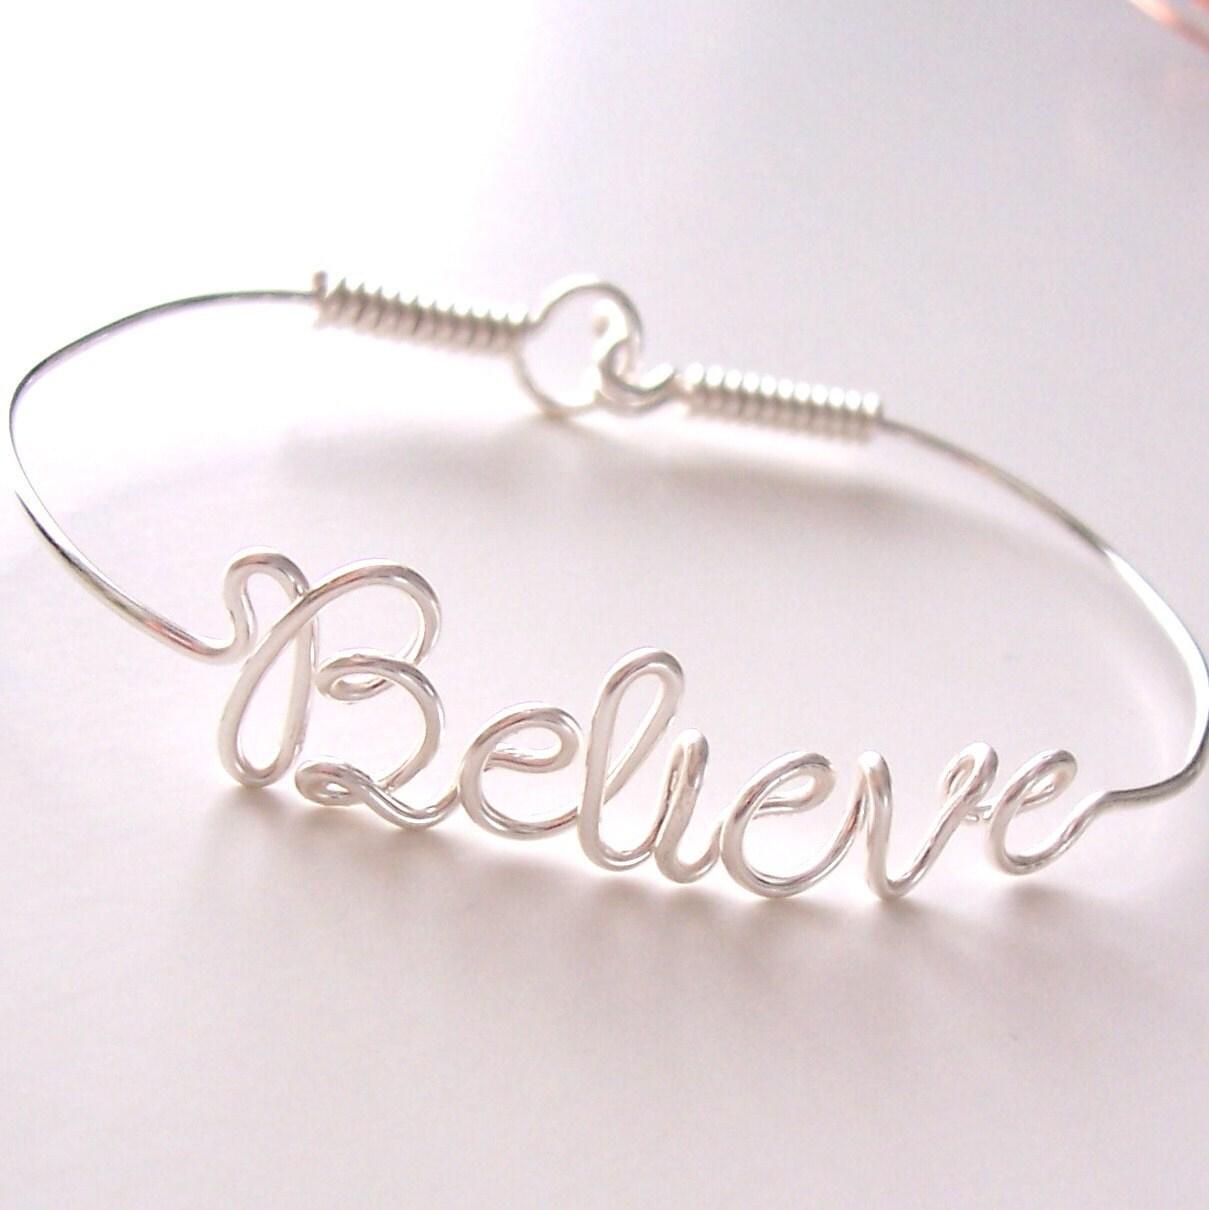 how to make name bracelets step by step